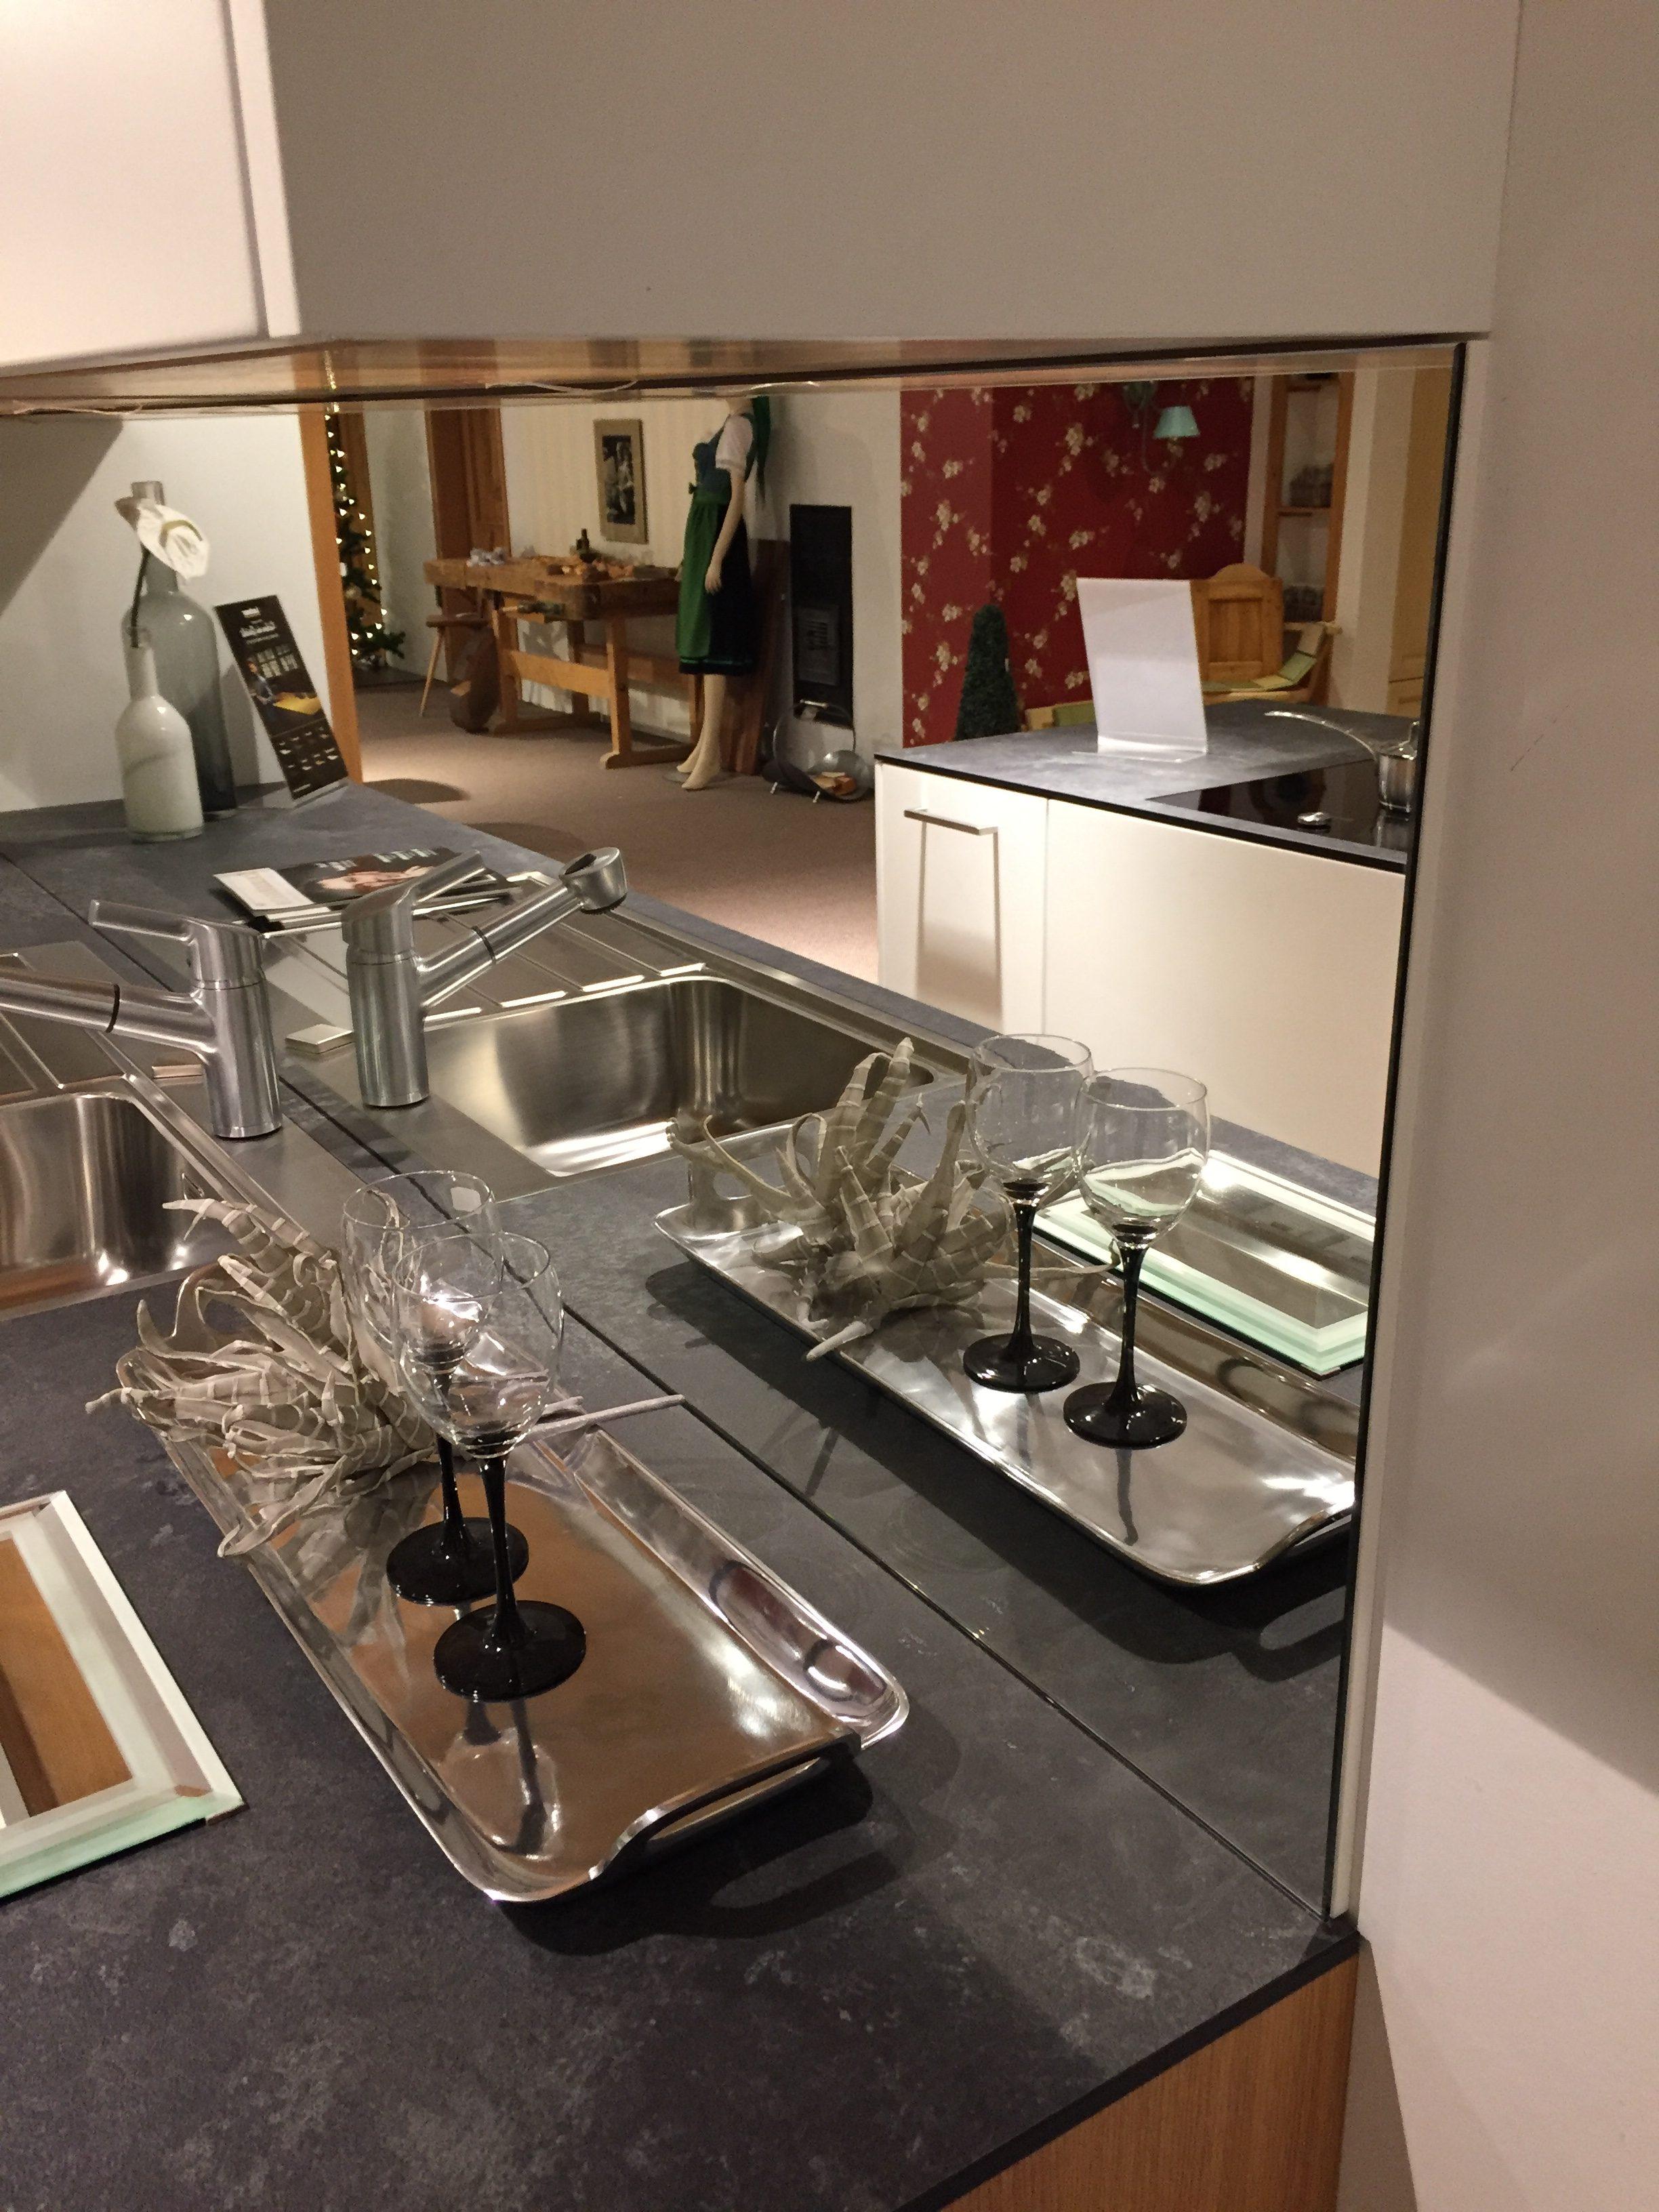 kchen hinterwand affordable raumteiler regal mit rckwand new csm team kueche loft eafa with. Black Bedroom Furniture Sets. Home Design Ideas